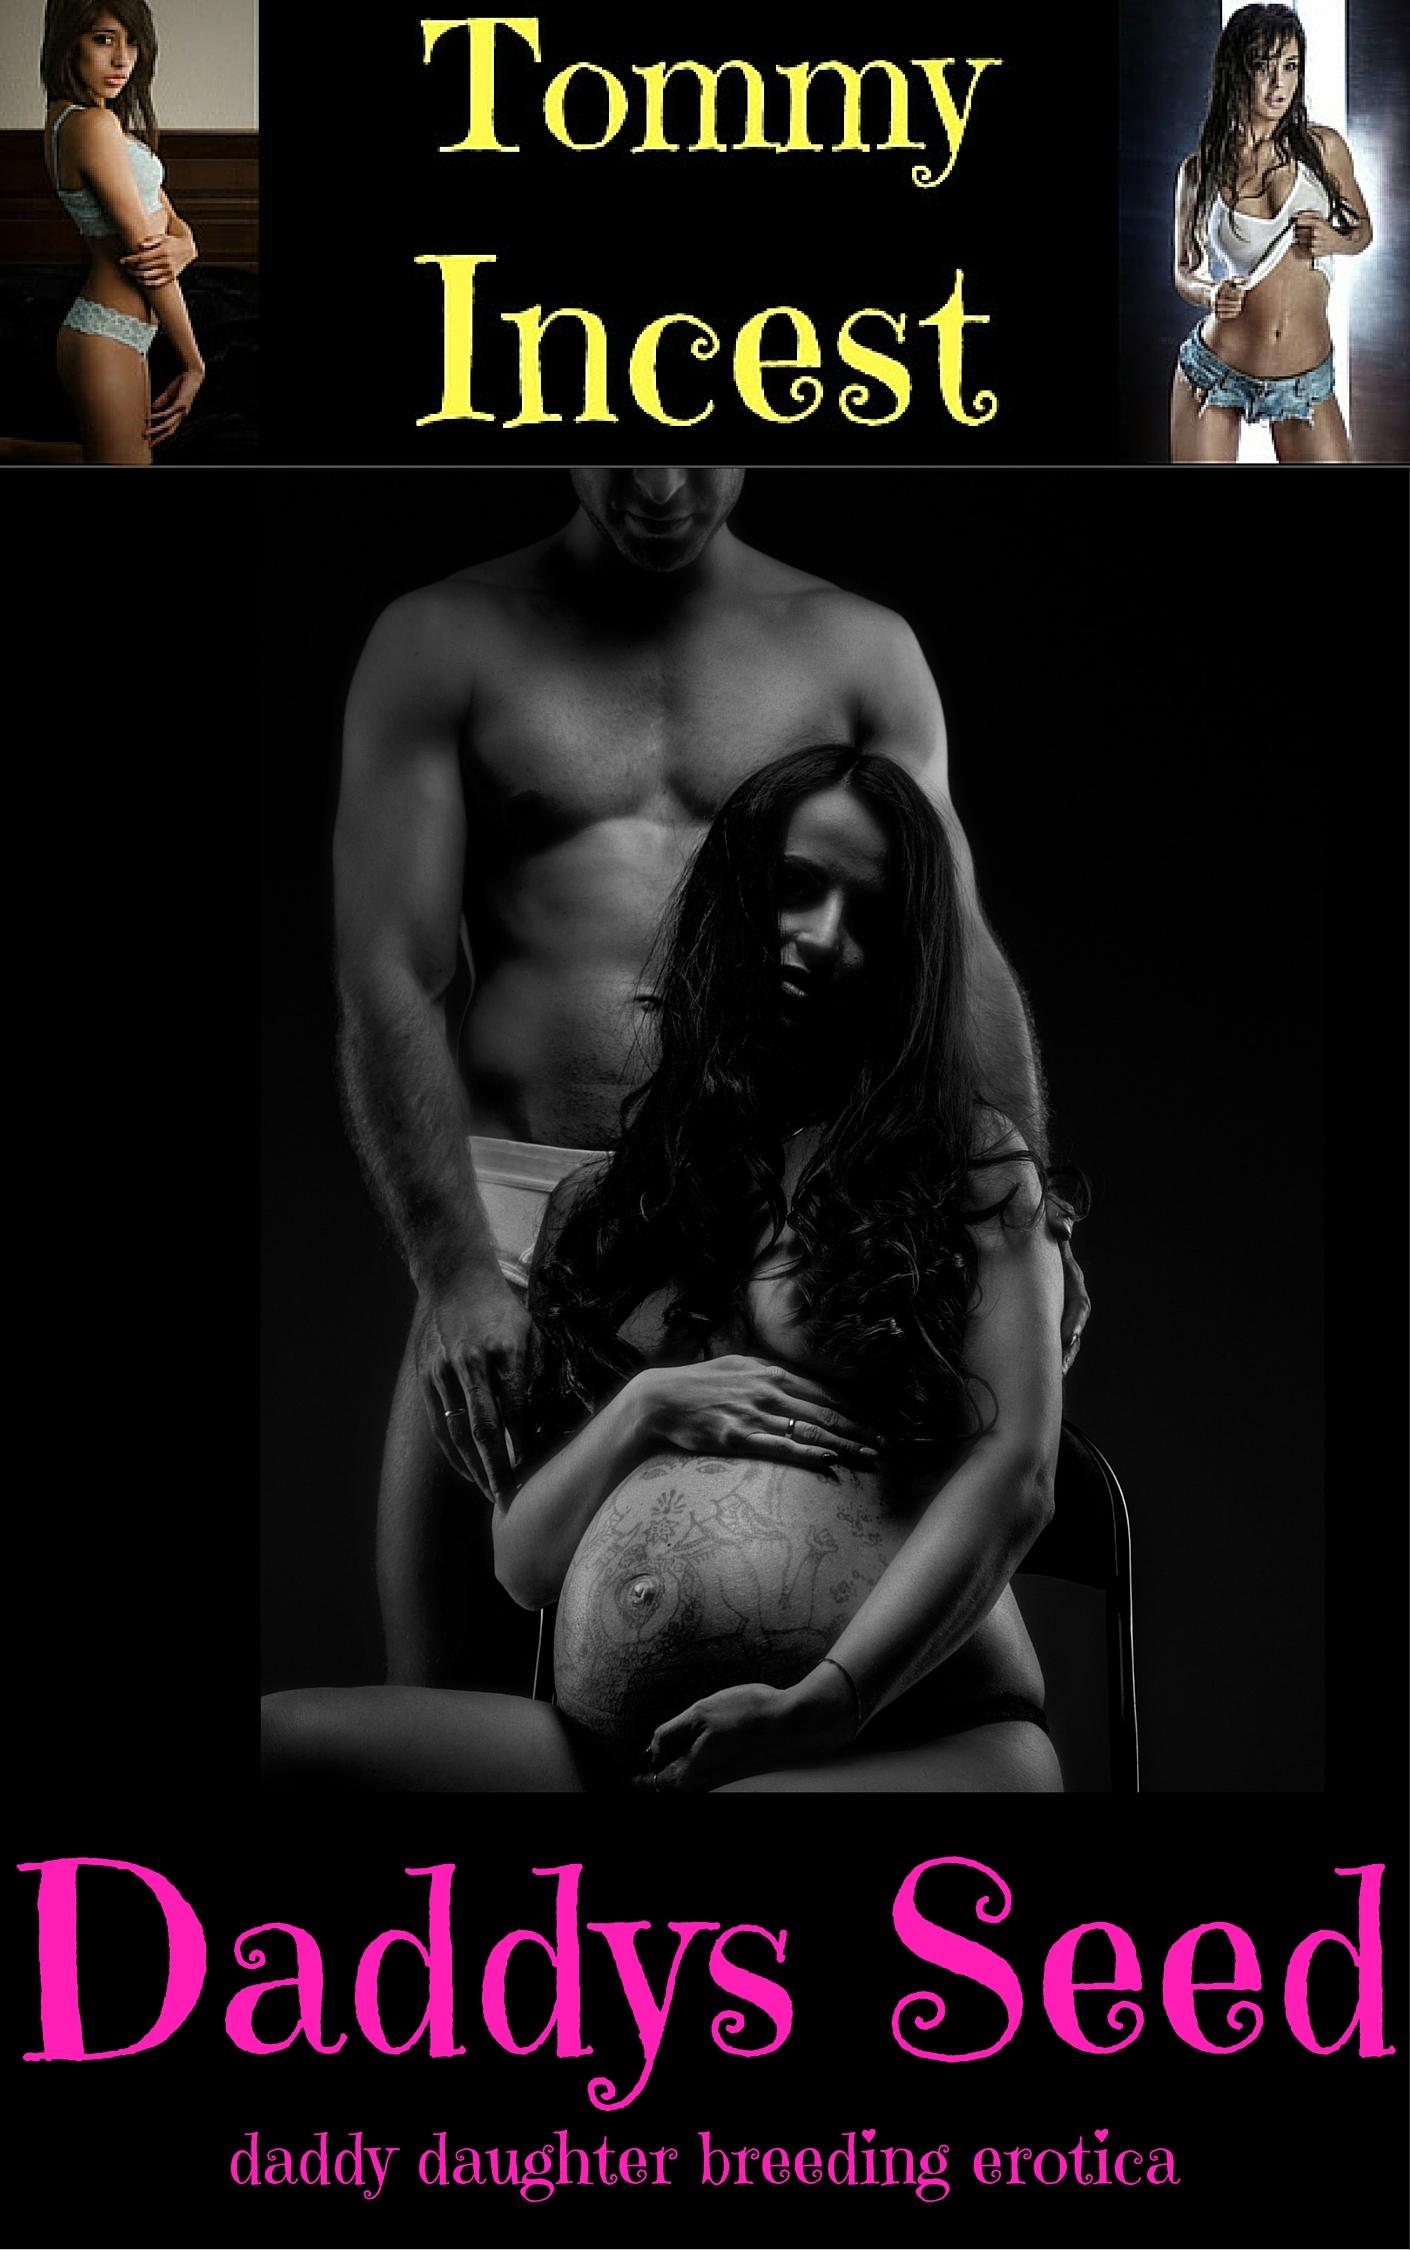 Erotic photography links